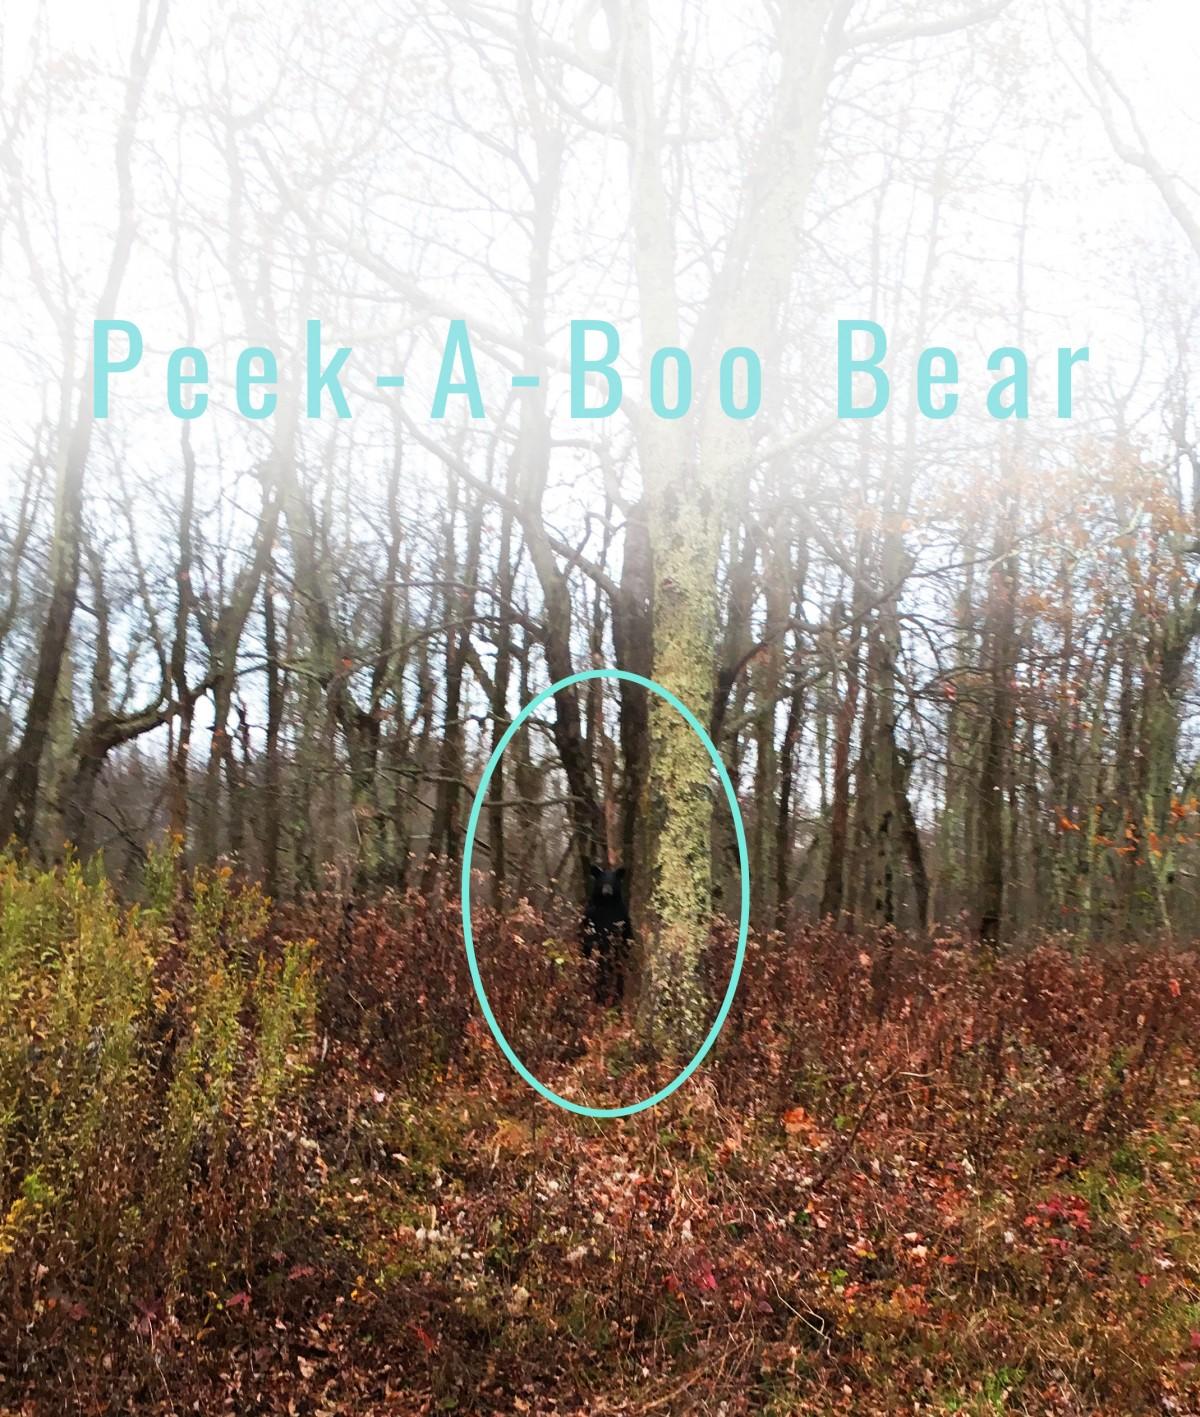 Bear Fall Peak Foliage Indian Summer USA Honeymoon Road Trip